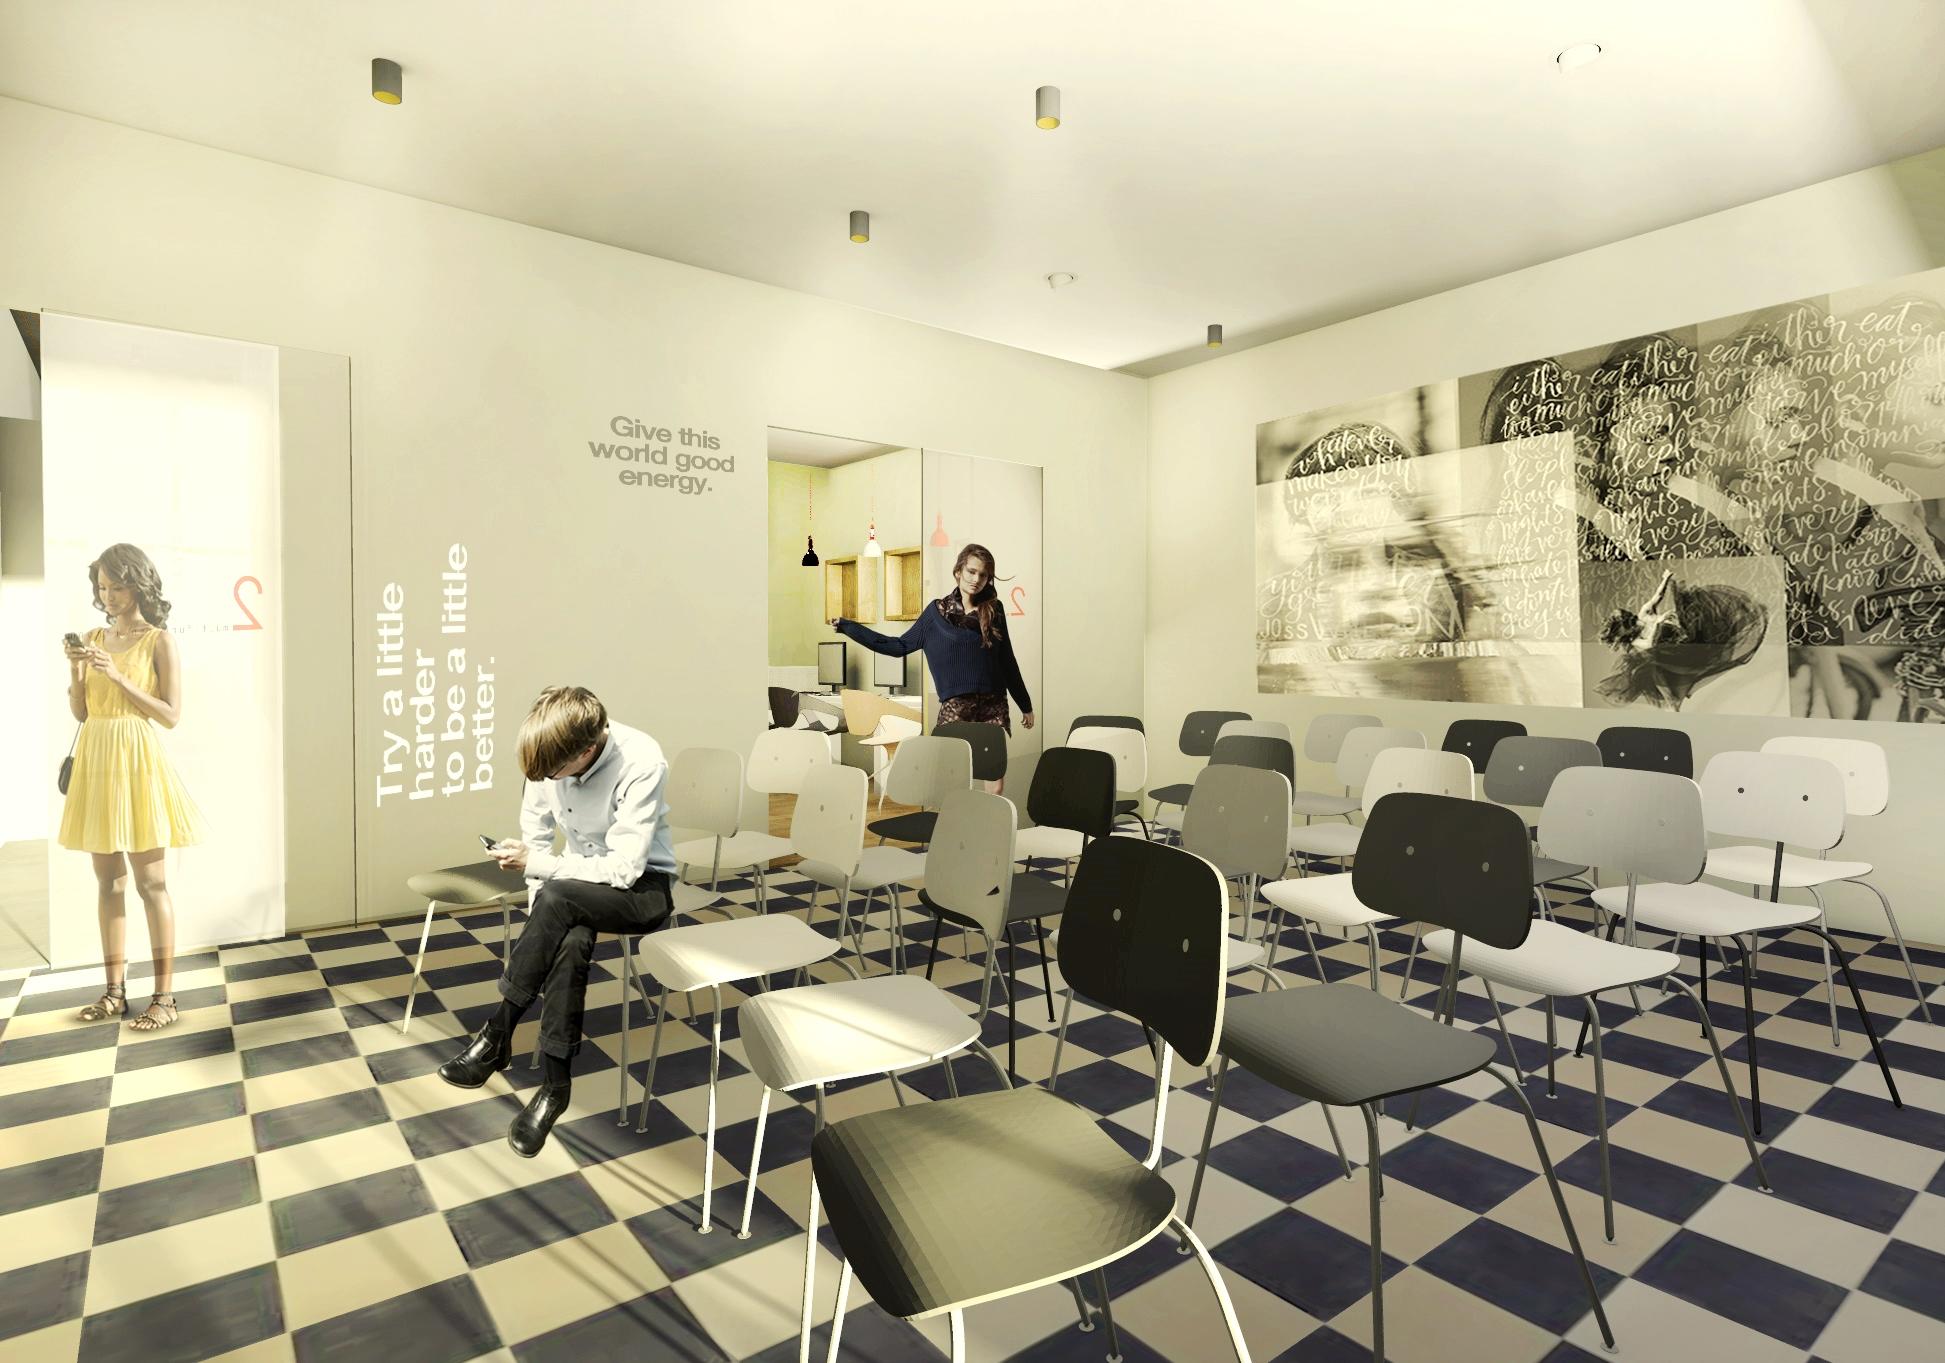 Omladinski centar, kulturno – edukativni prostor za mlade